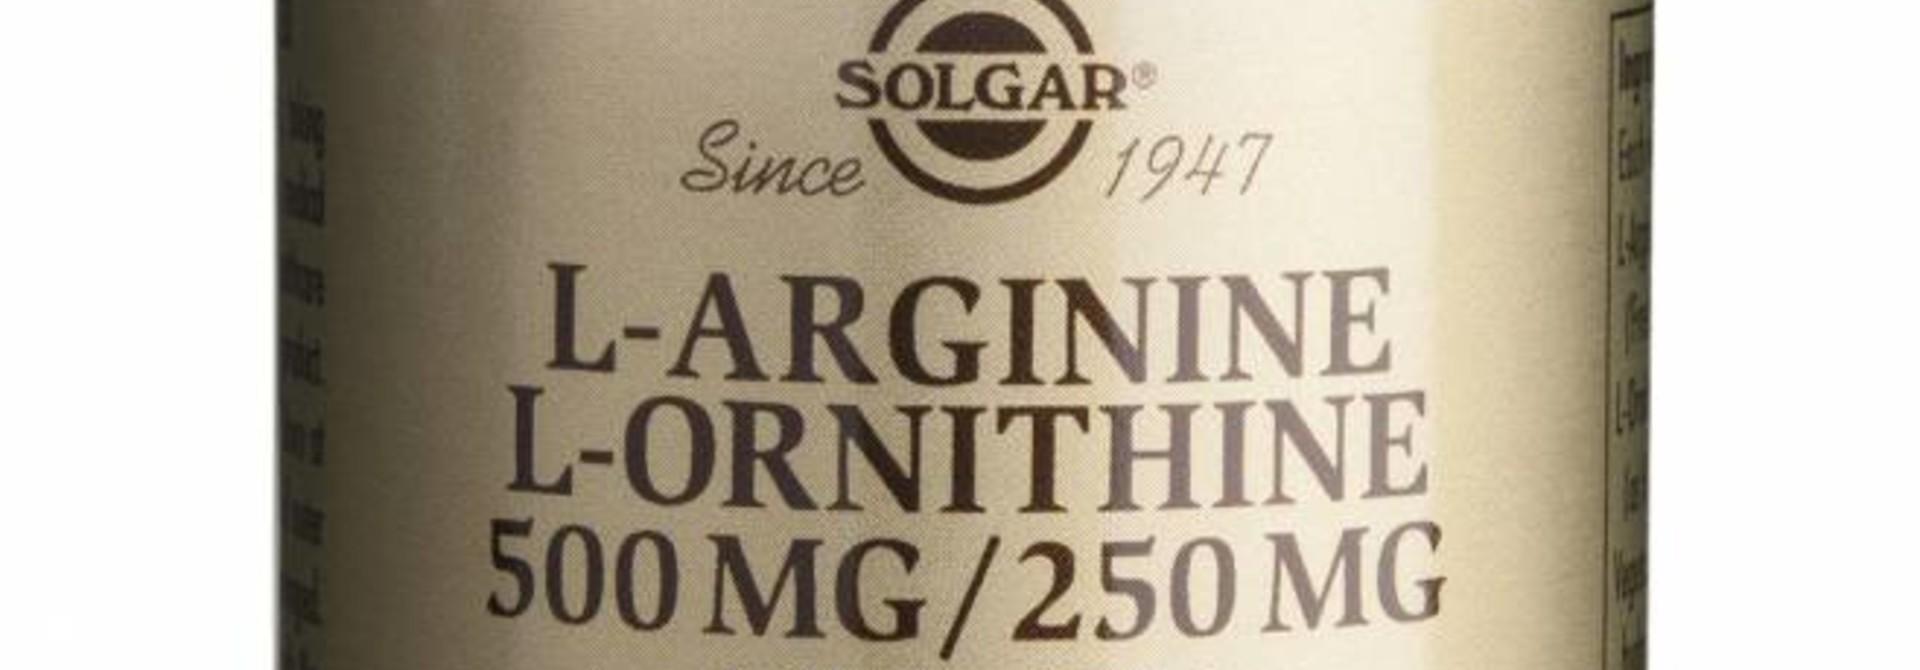 L-Arginine/L-Ornithine 500/250 mg 50 plantaardige capsules